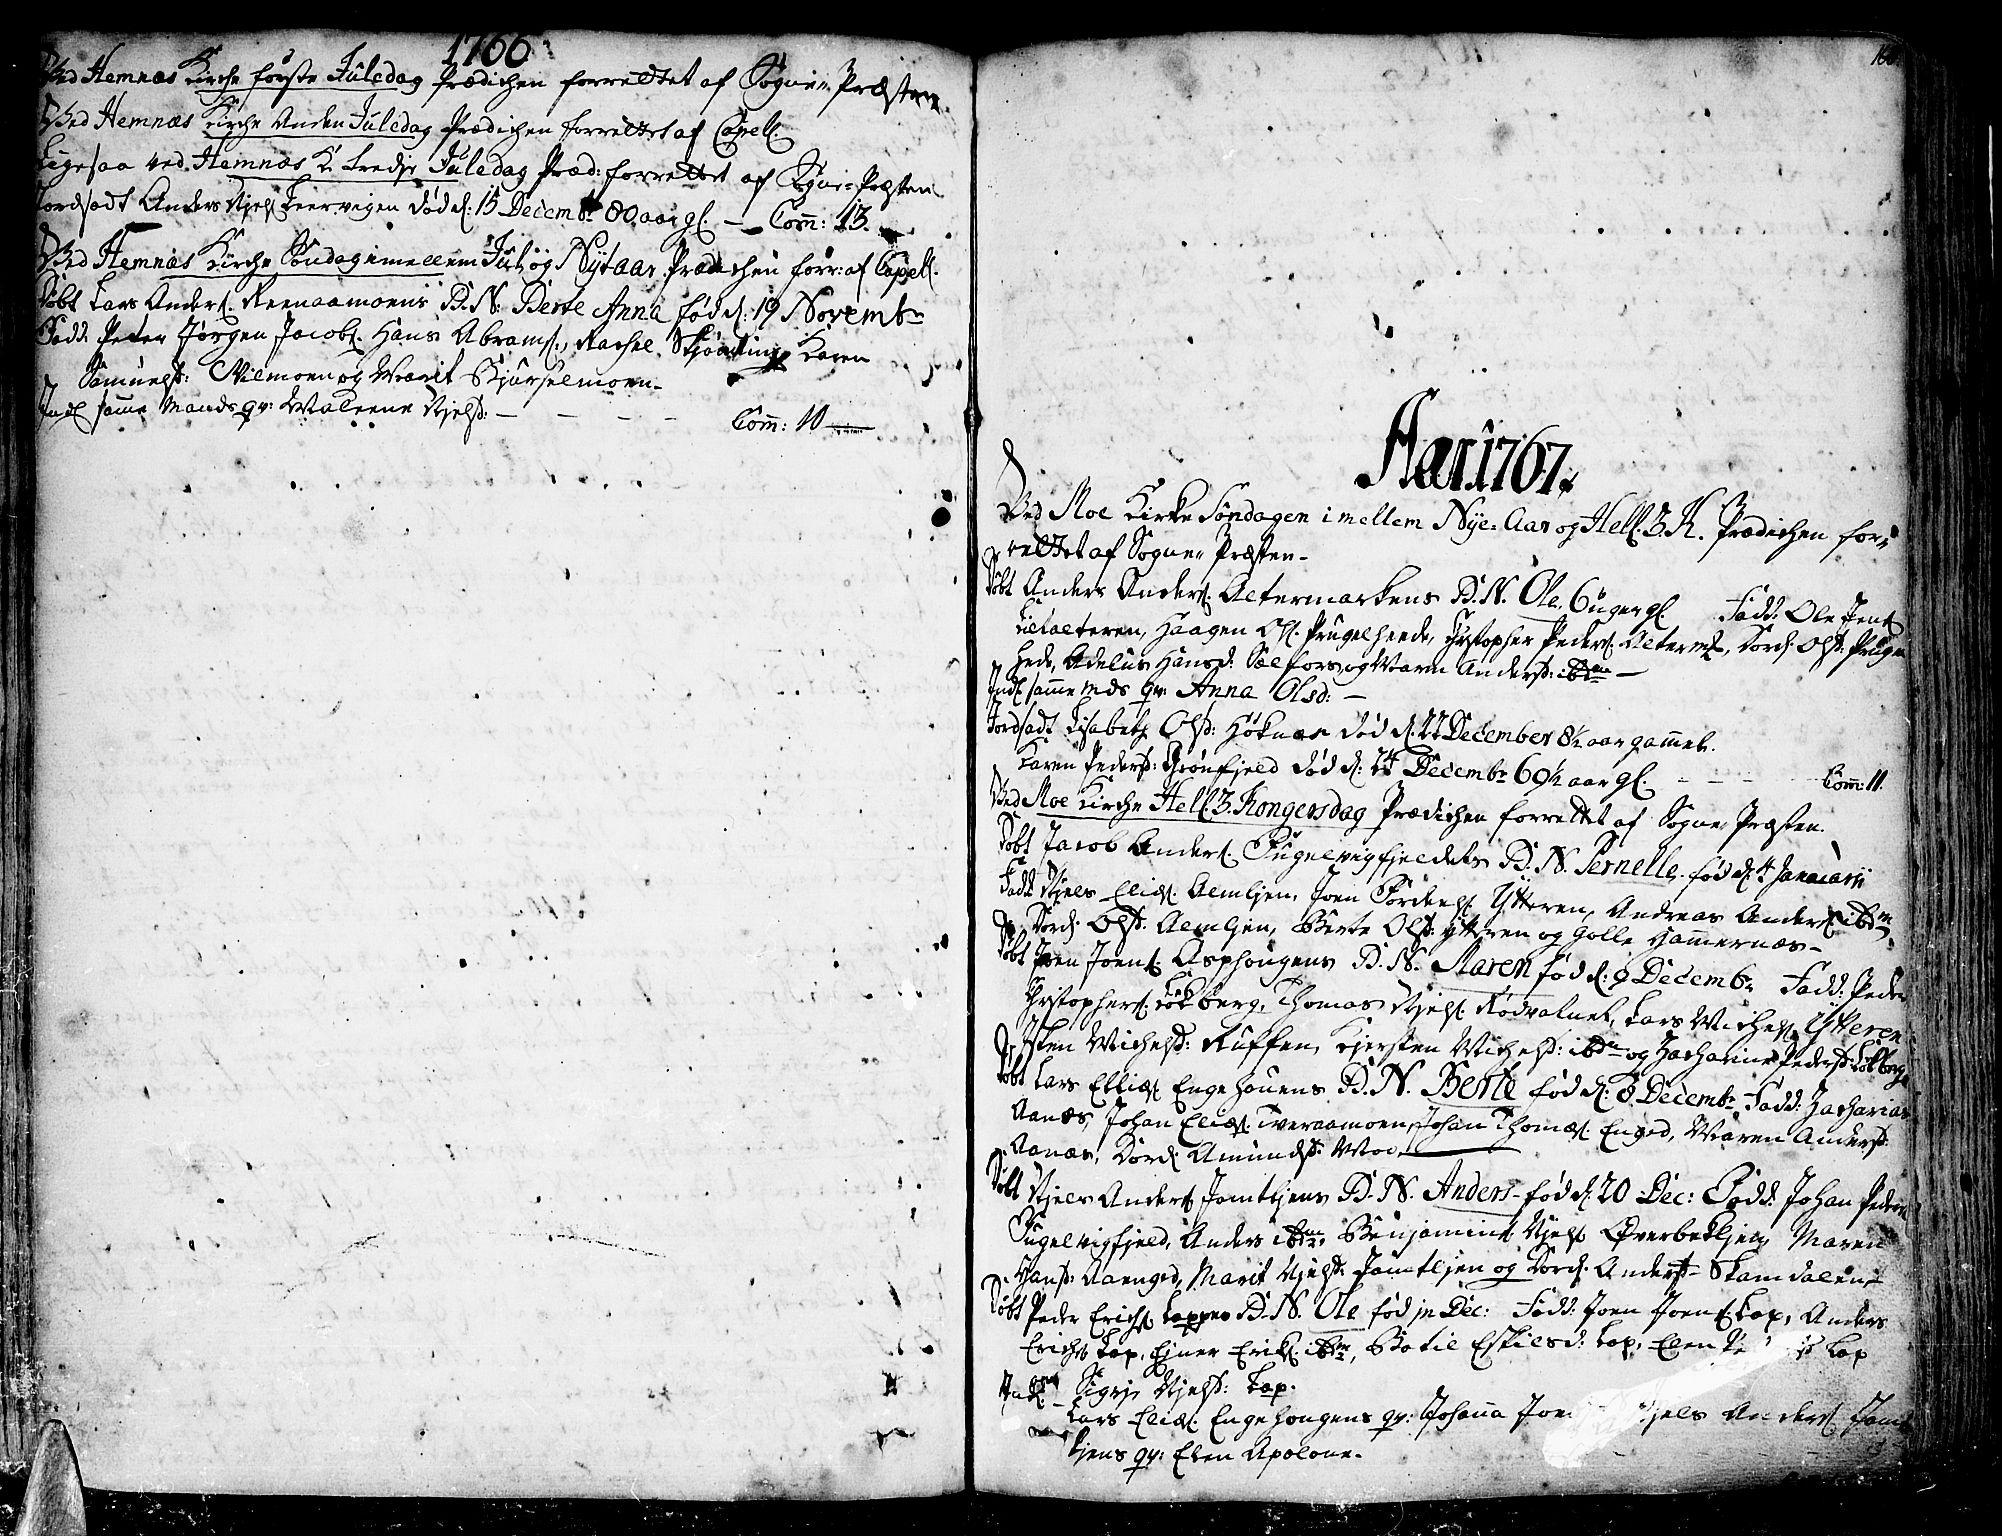 SAT, Ministerialprotokoller, klokkerbøker og fødselsregistre - Nordland, 825/L0348: Ministerialbok nr. 825A04, 1752-1788, s. 160